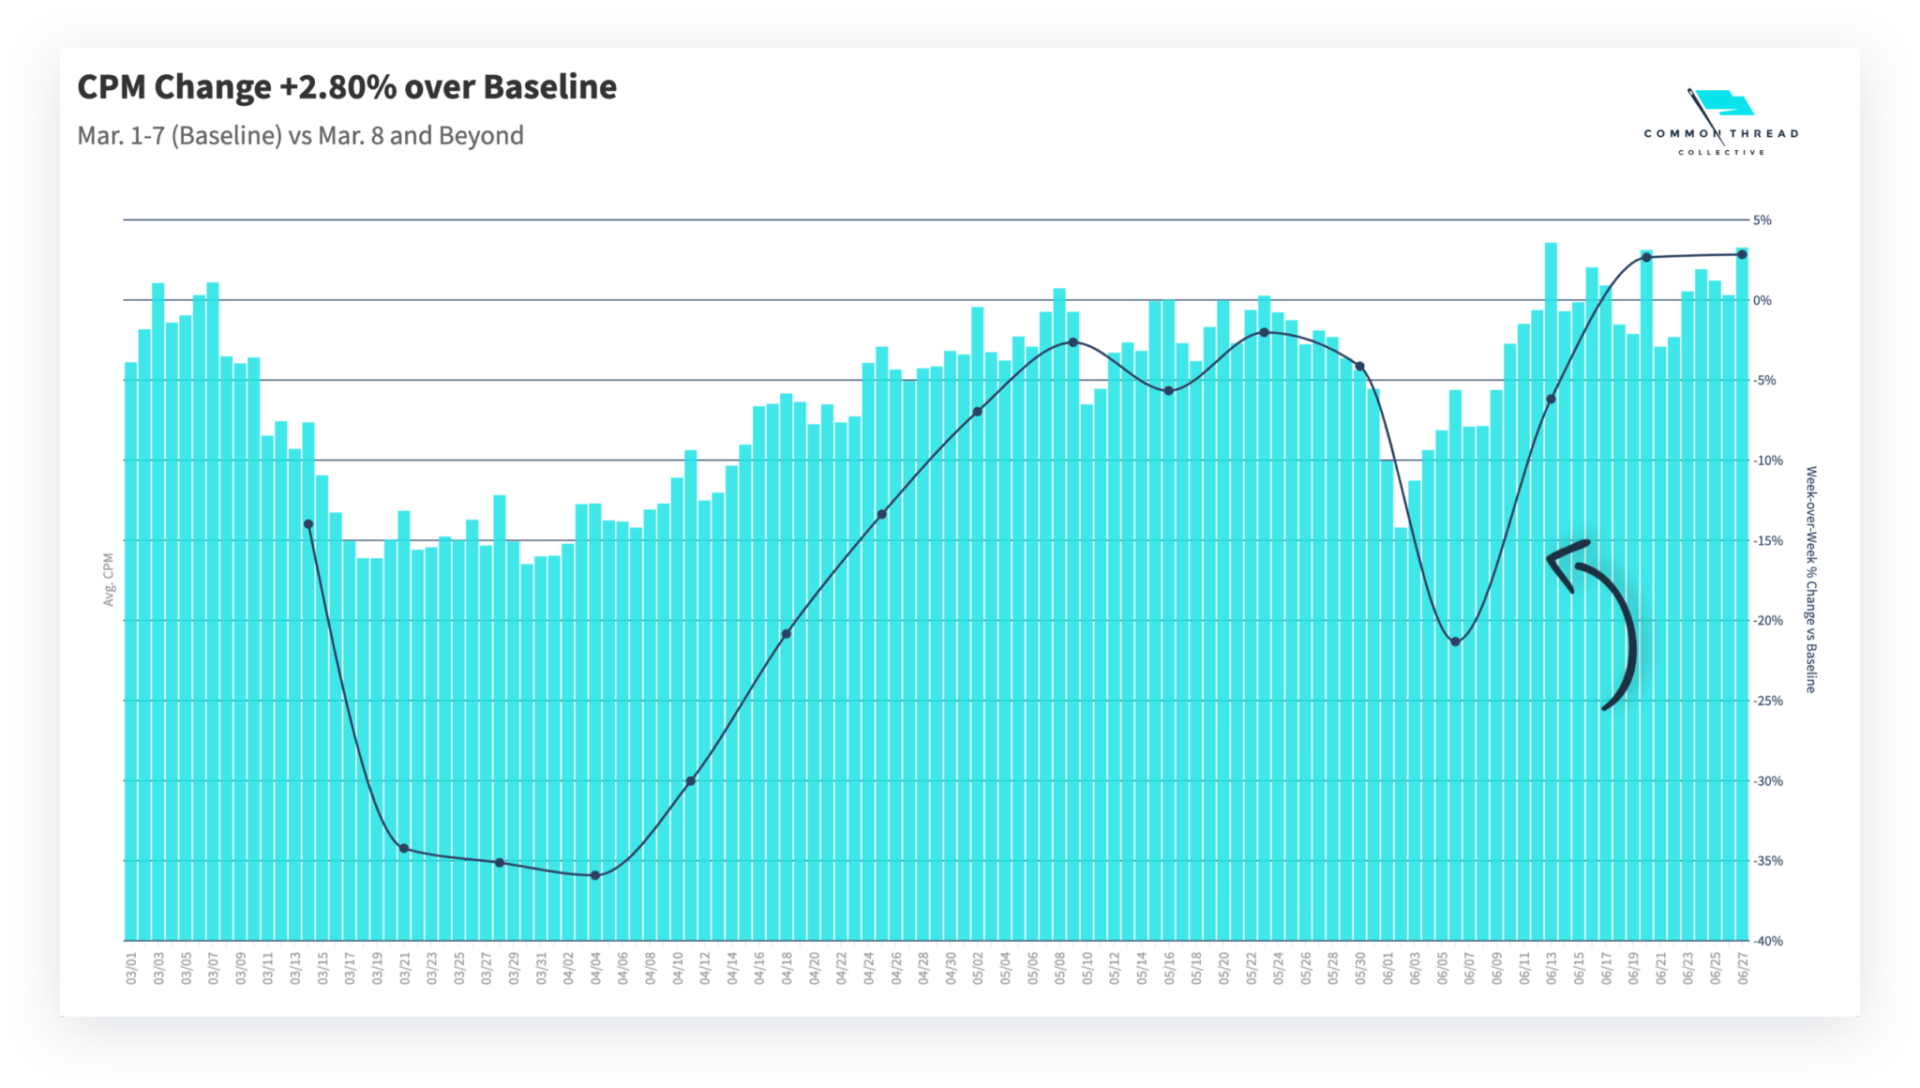 CPM change data March-April